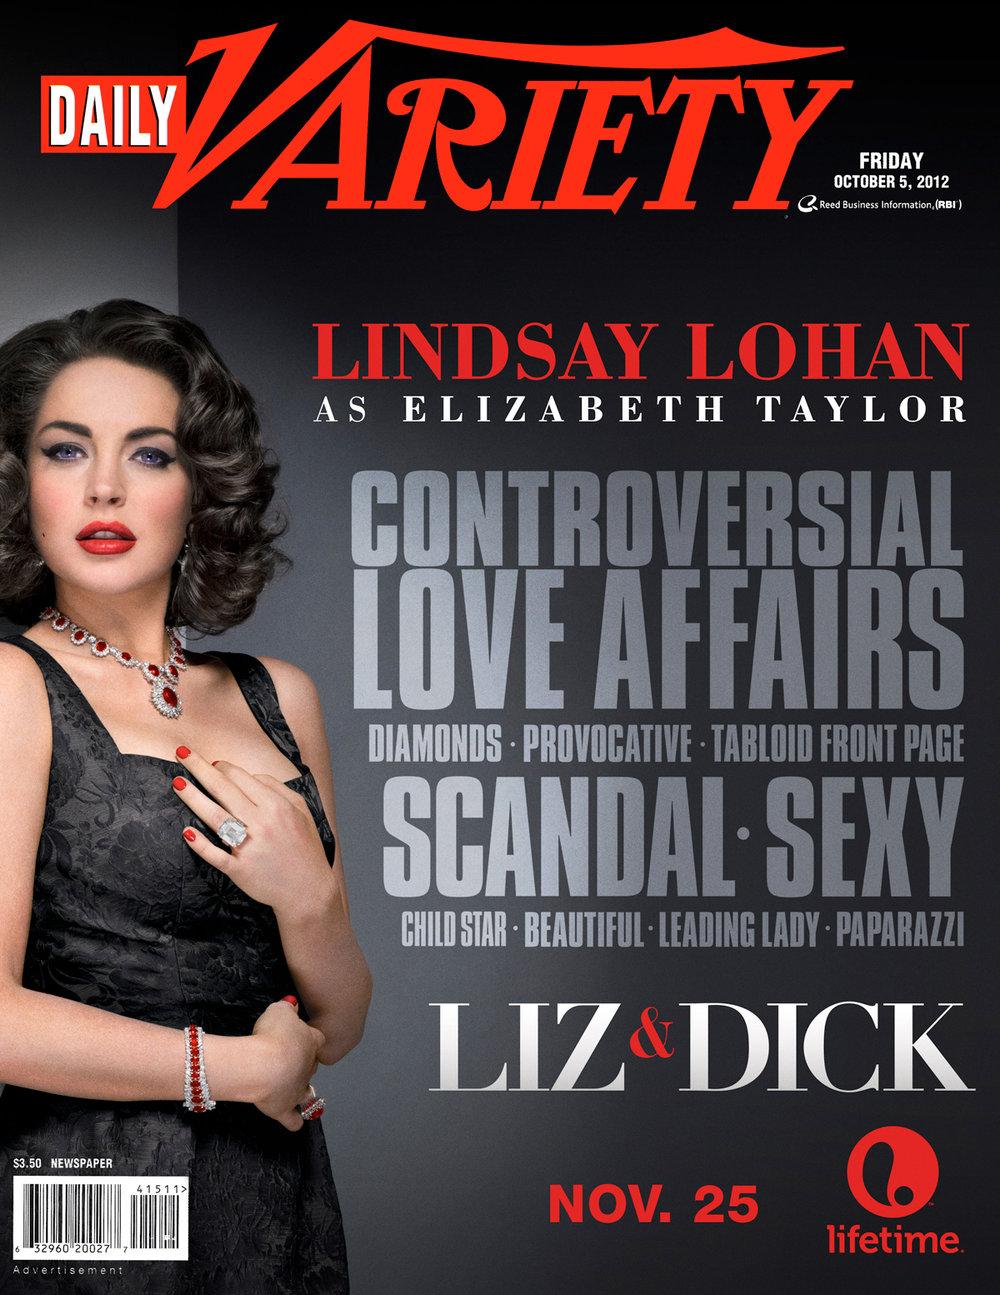 TV_LIfetime_ElizabethTaylor_Lohan_Variety.jpg